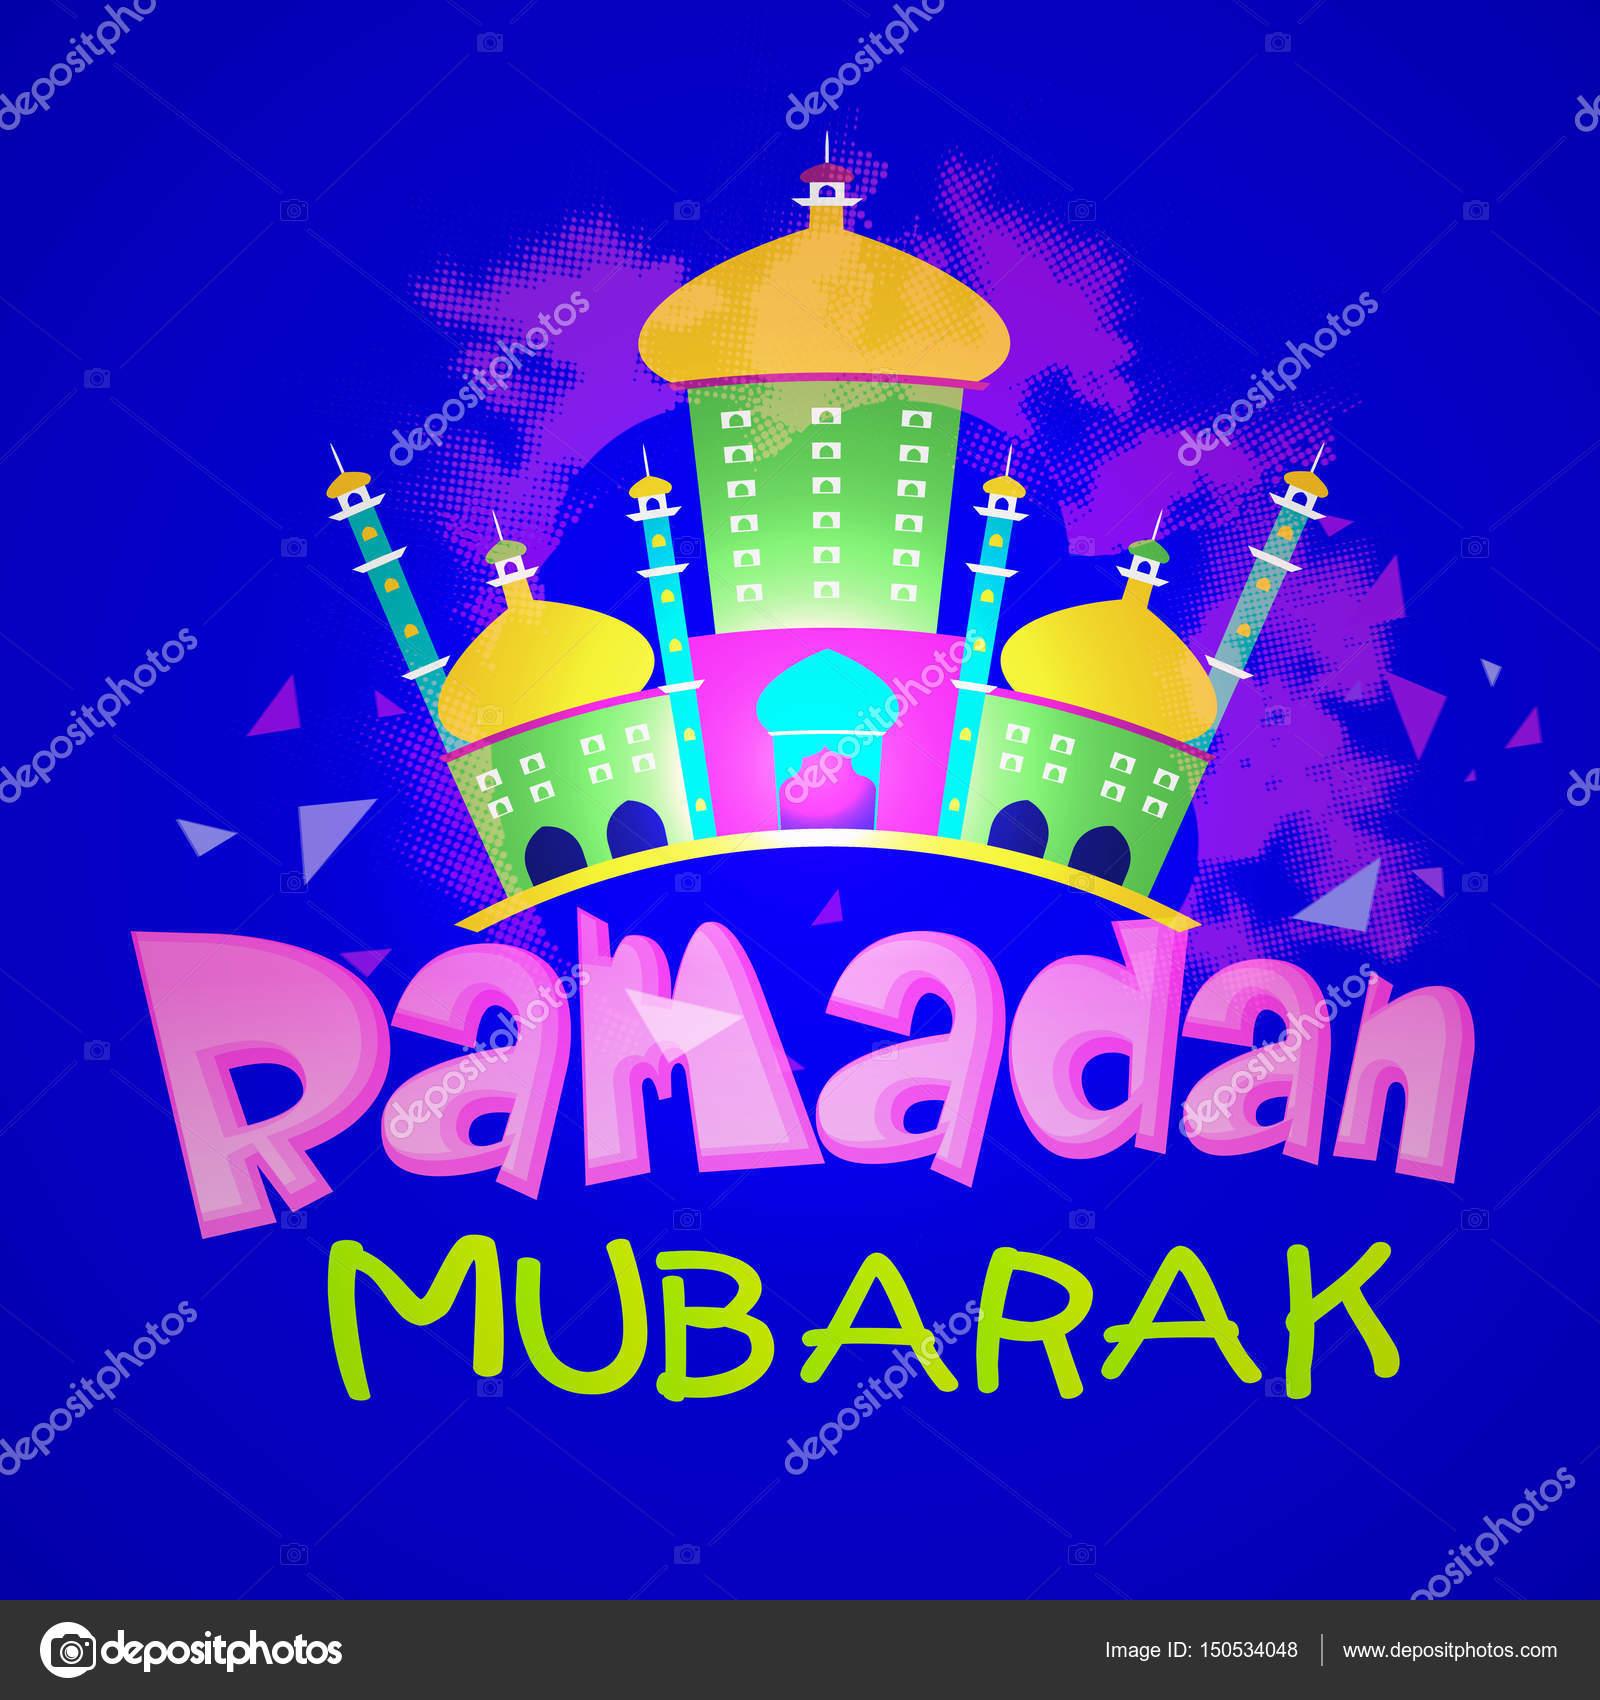 Ramadan mubarak greeting card with mosque stock vector ramadan mubarak greeting card with mosque stock vector m4hsunfo Choice Image